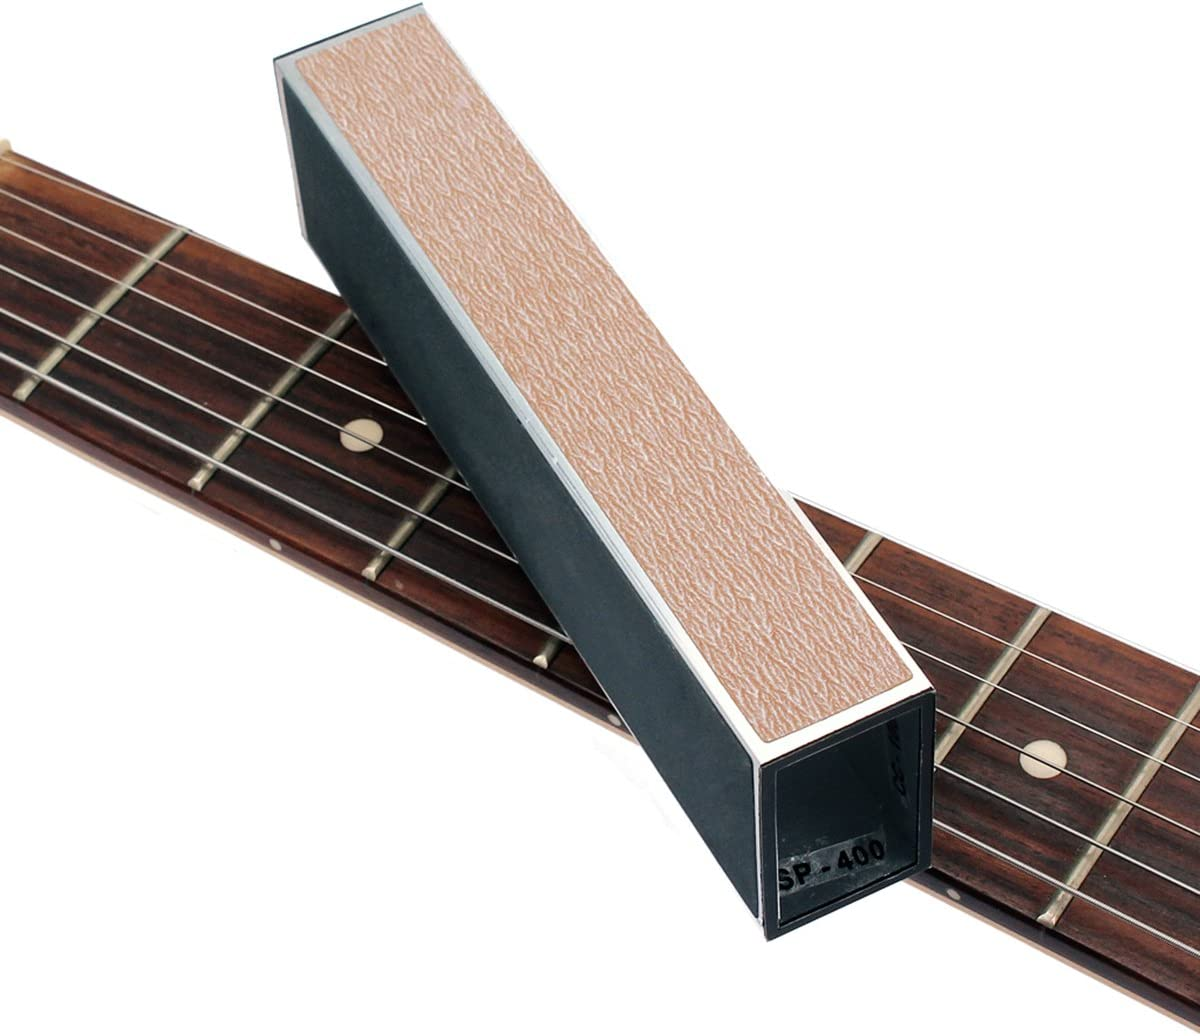 ultnice chitarra Bass Fret Leveling file Schleifen Luthier Tool con carta vetrata